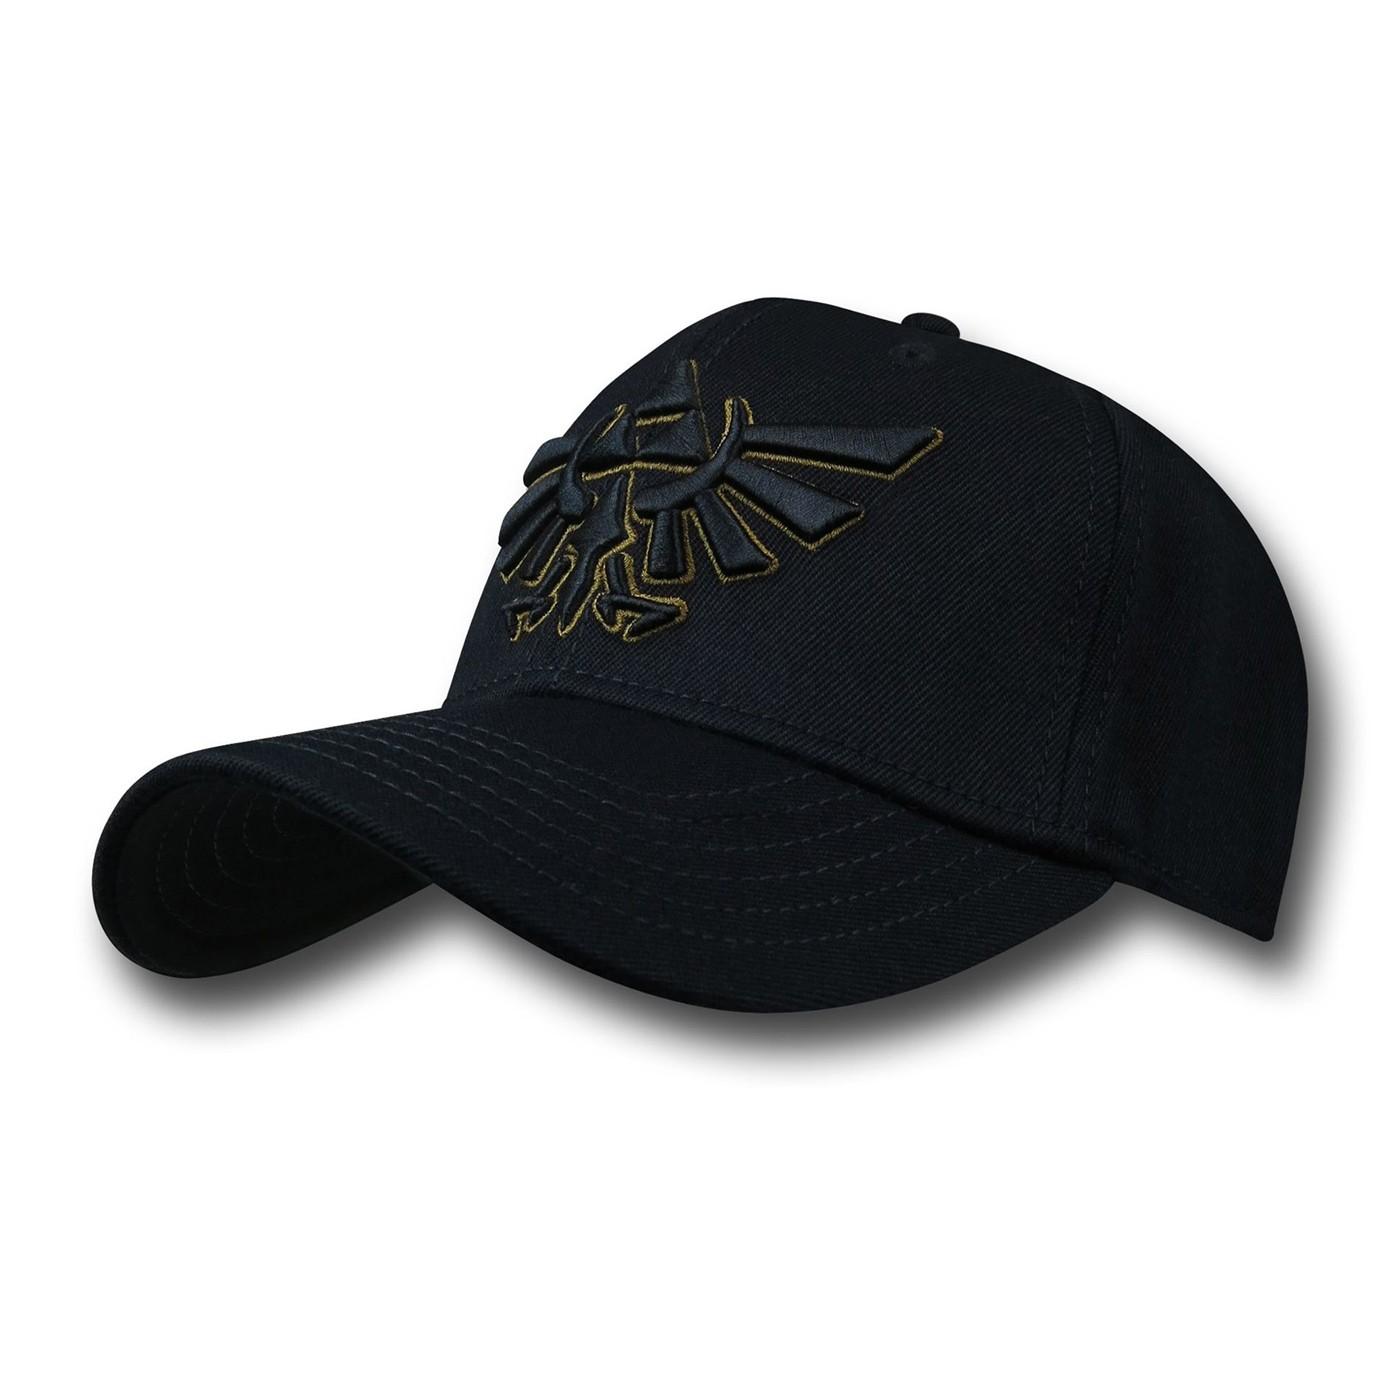 1a1b7c02a Zelda Triforce Flex Fit Hat